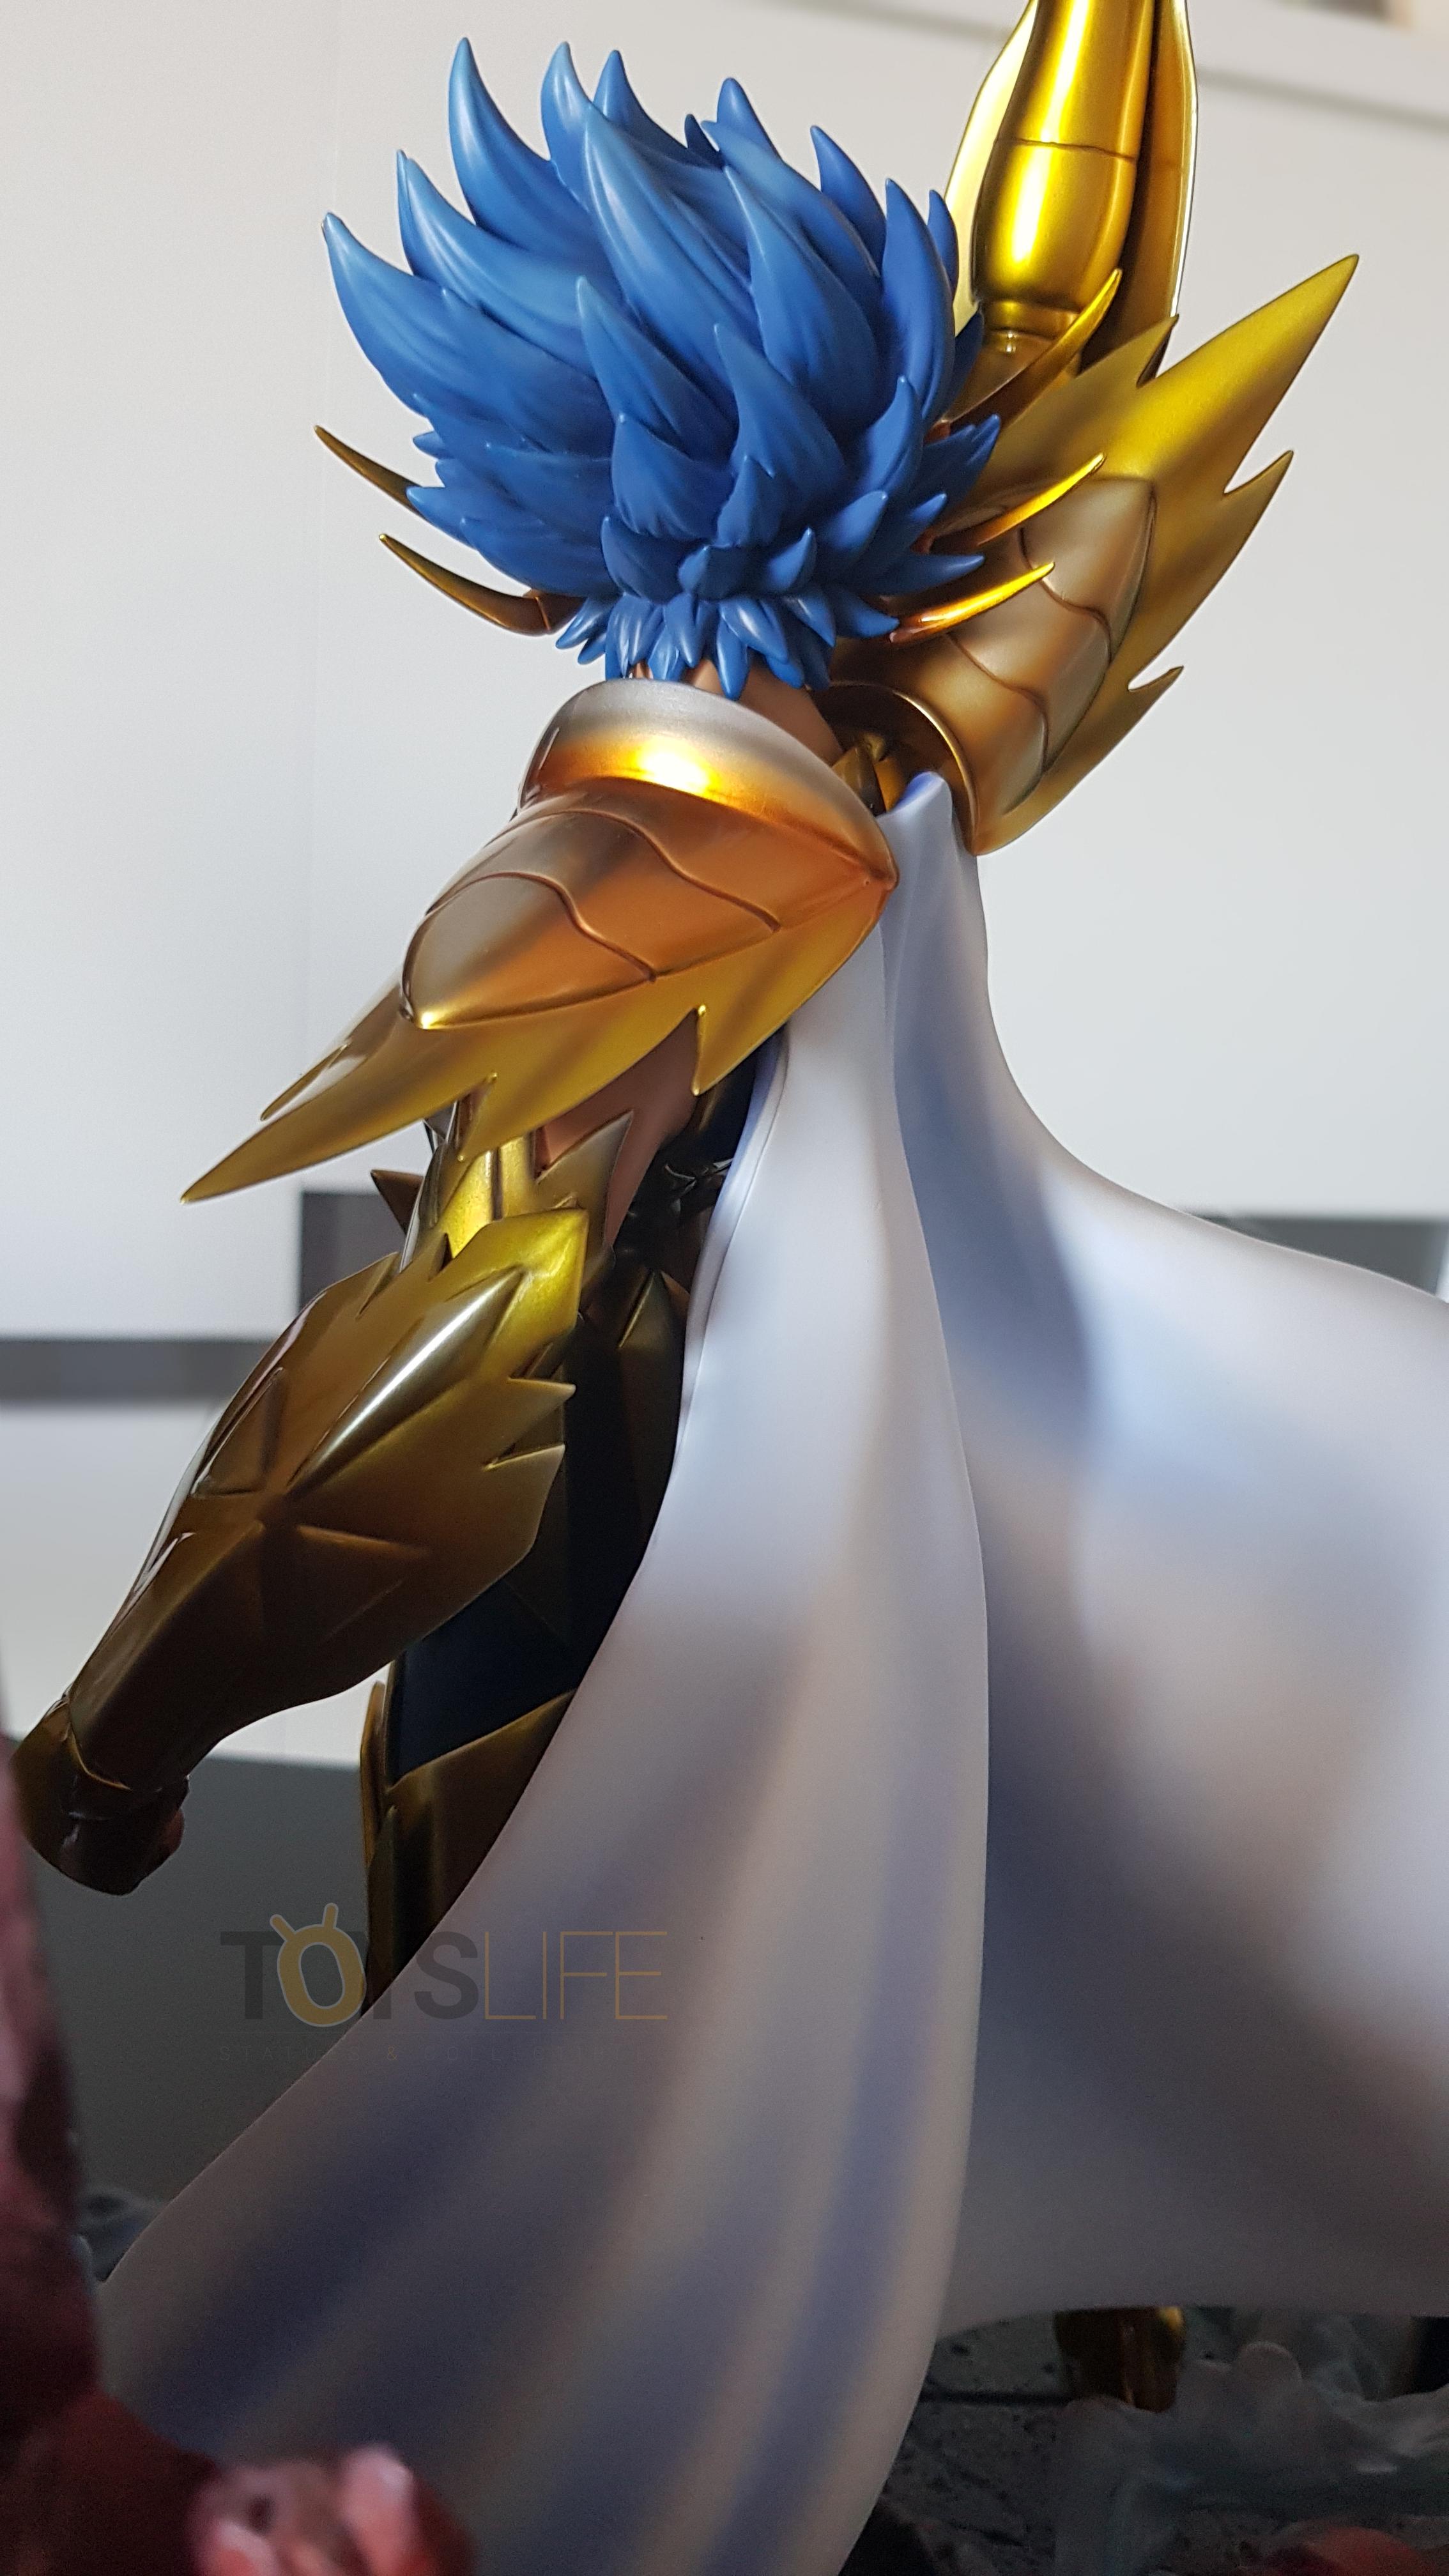 tsume-art-saint-seiya-gold-saint-death-mask-statue-toyslife-review-35